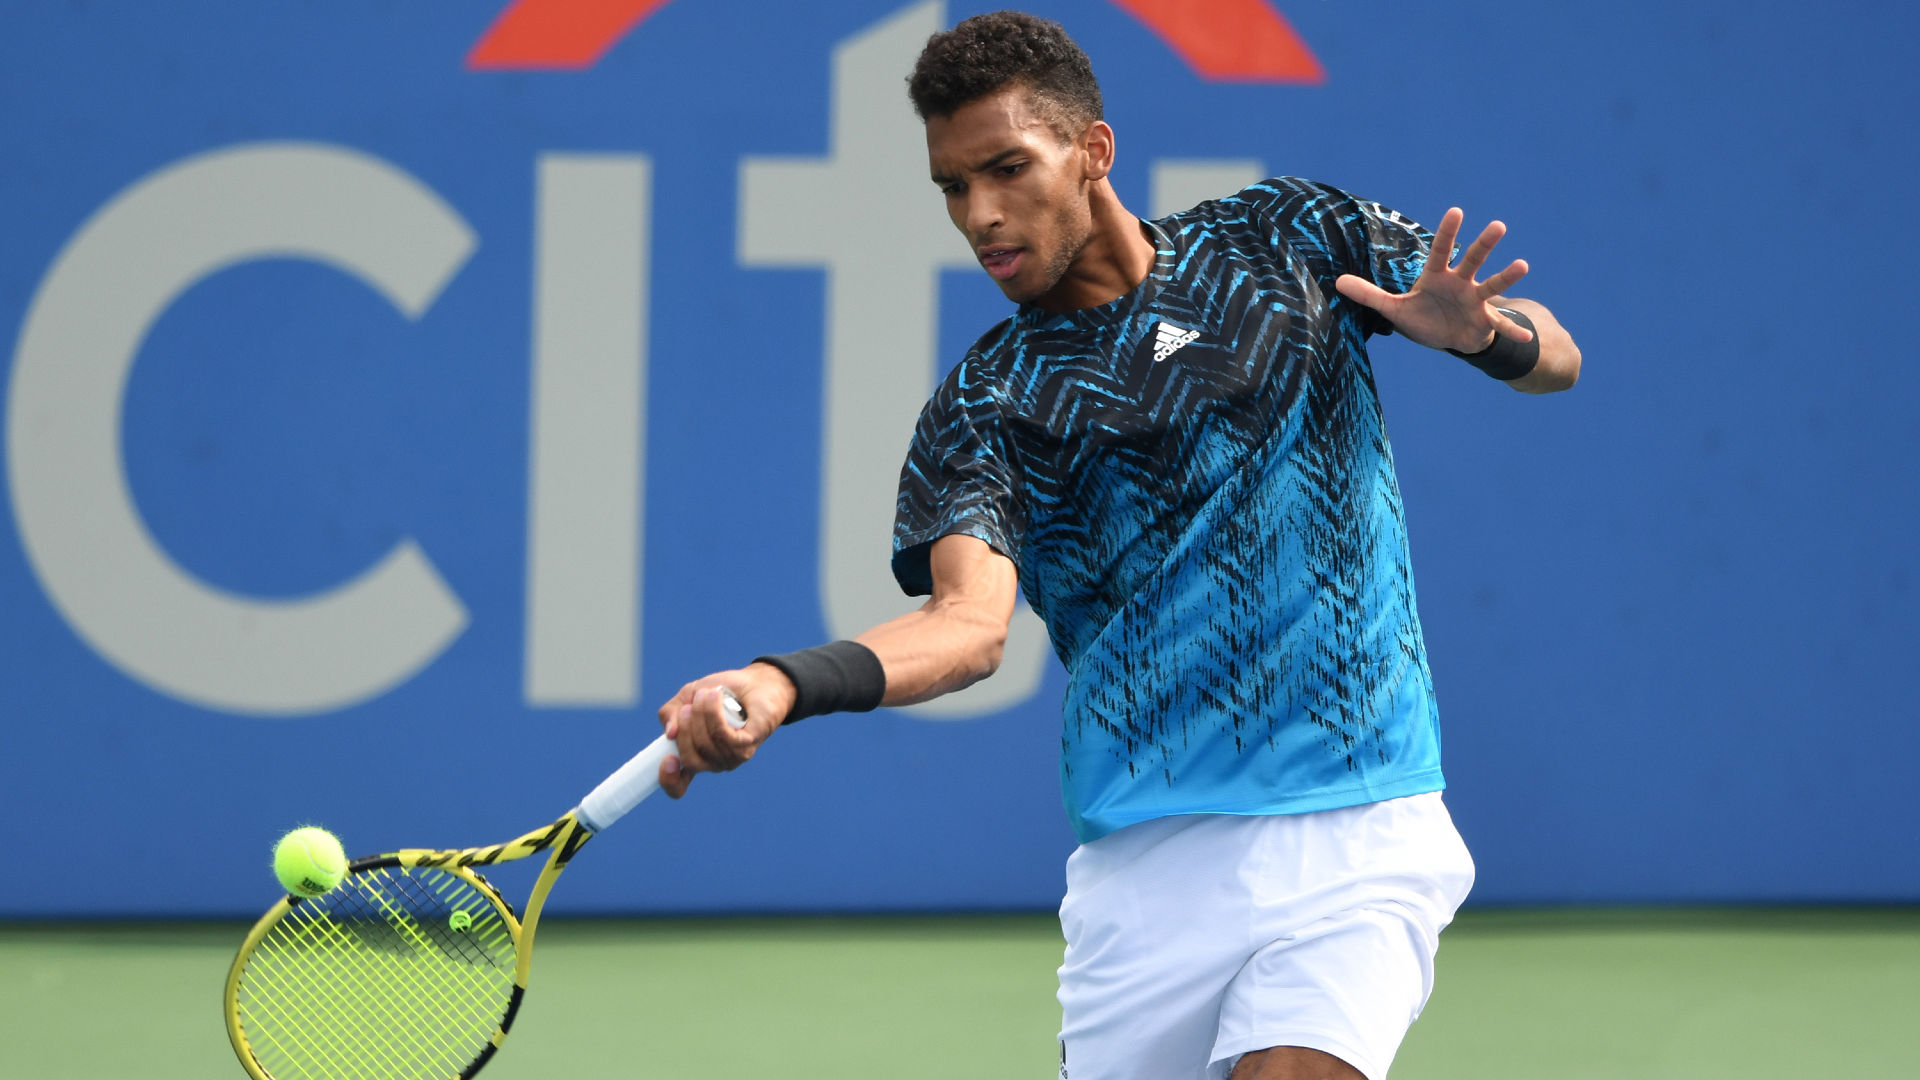 Washington Open 2021: Felix Auger-Aliassime vs. Jenson Brooksby Tennis Pick and Prediction